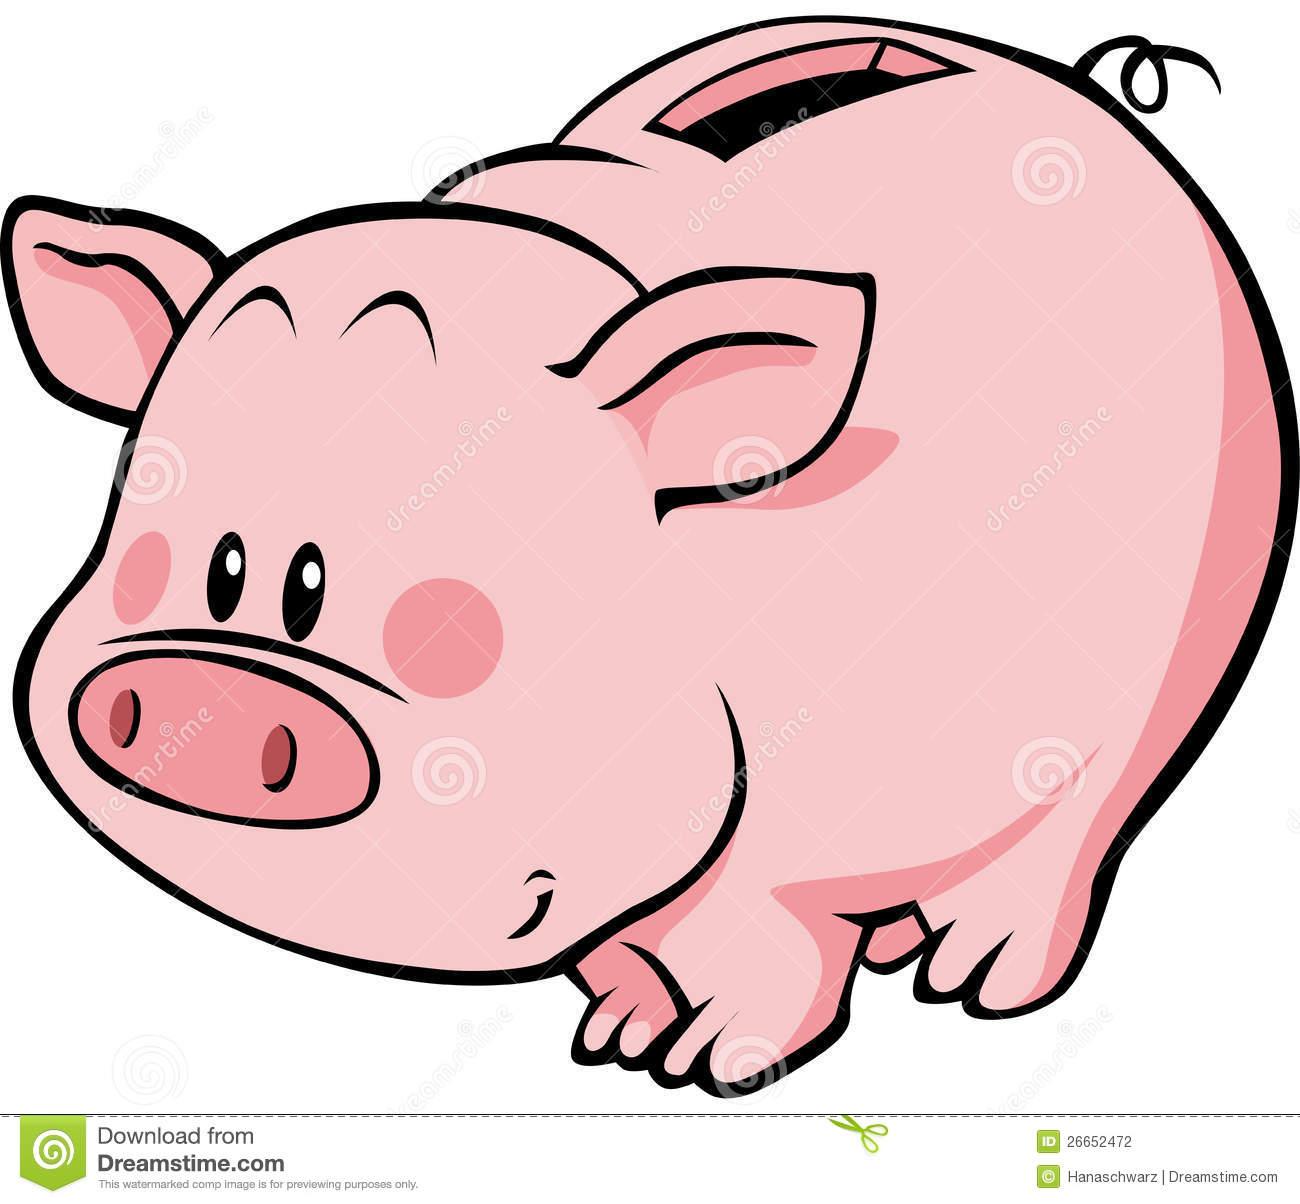 Piggy Bank Clipart-hdcliparta - Piggy Bank Clipart